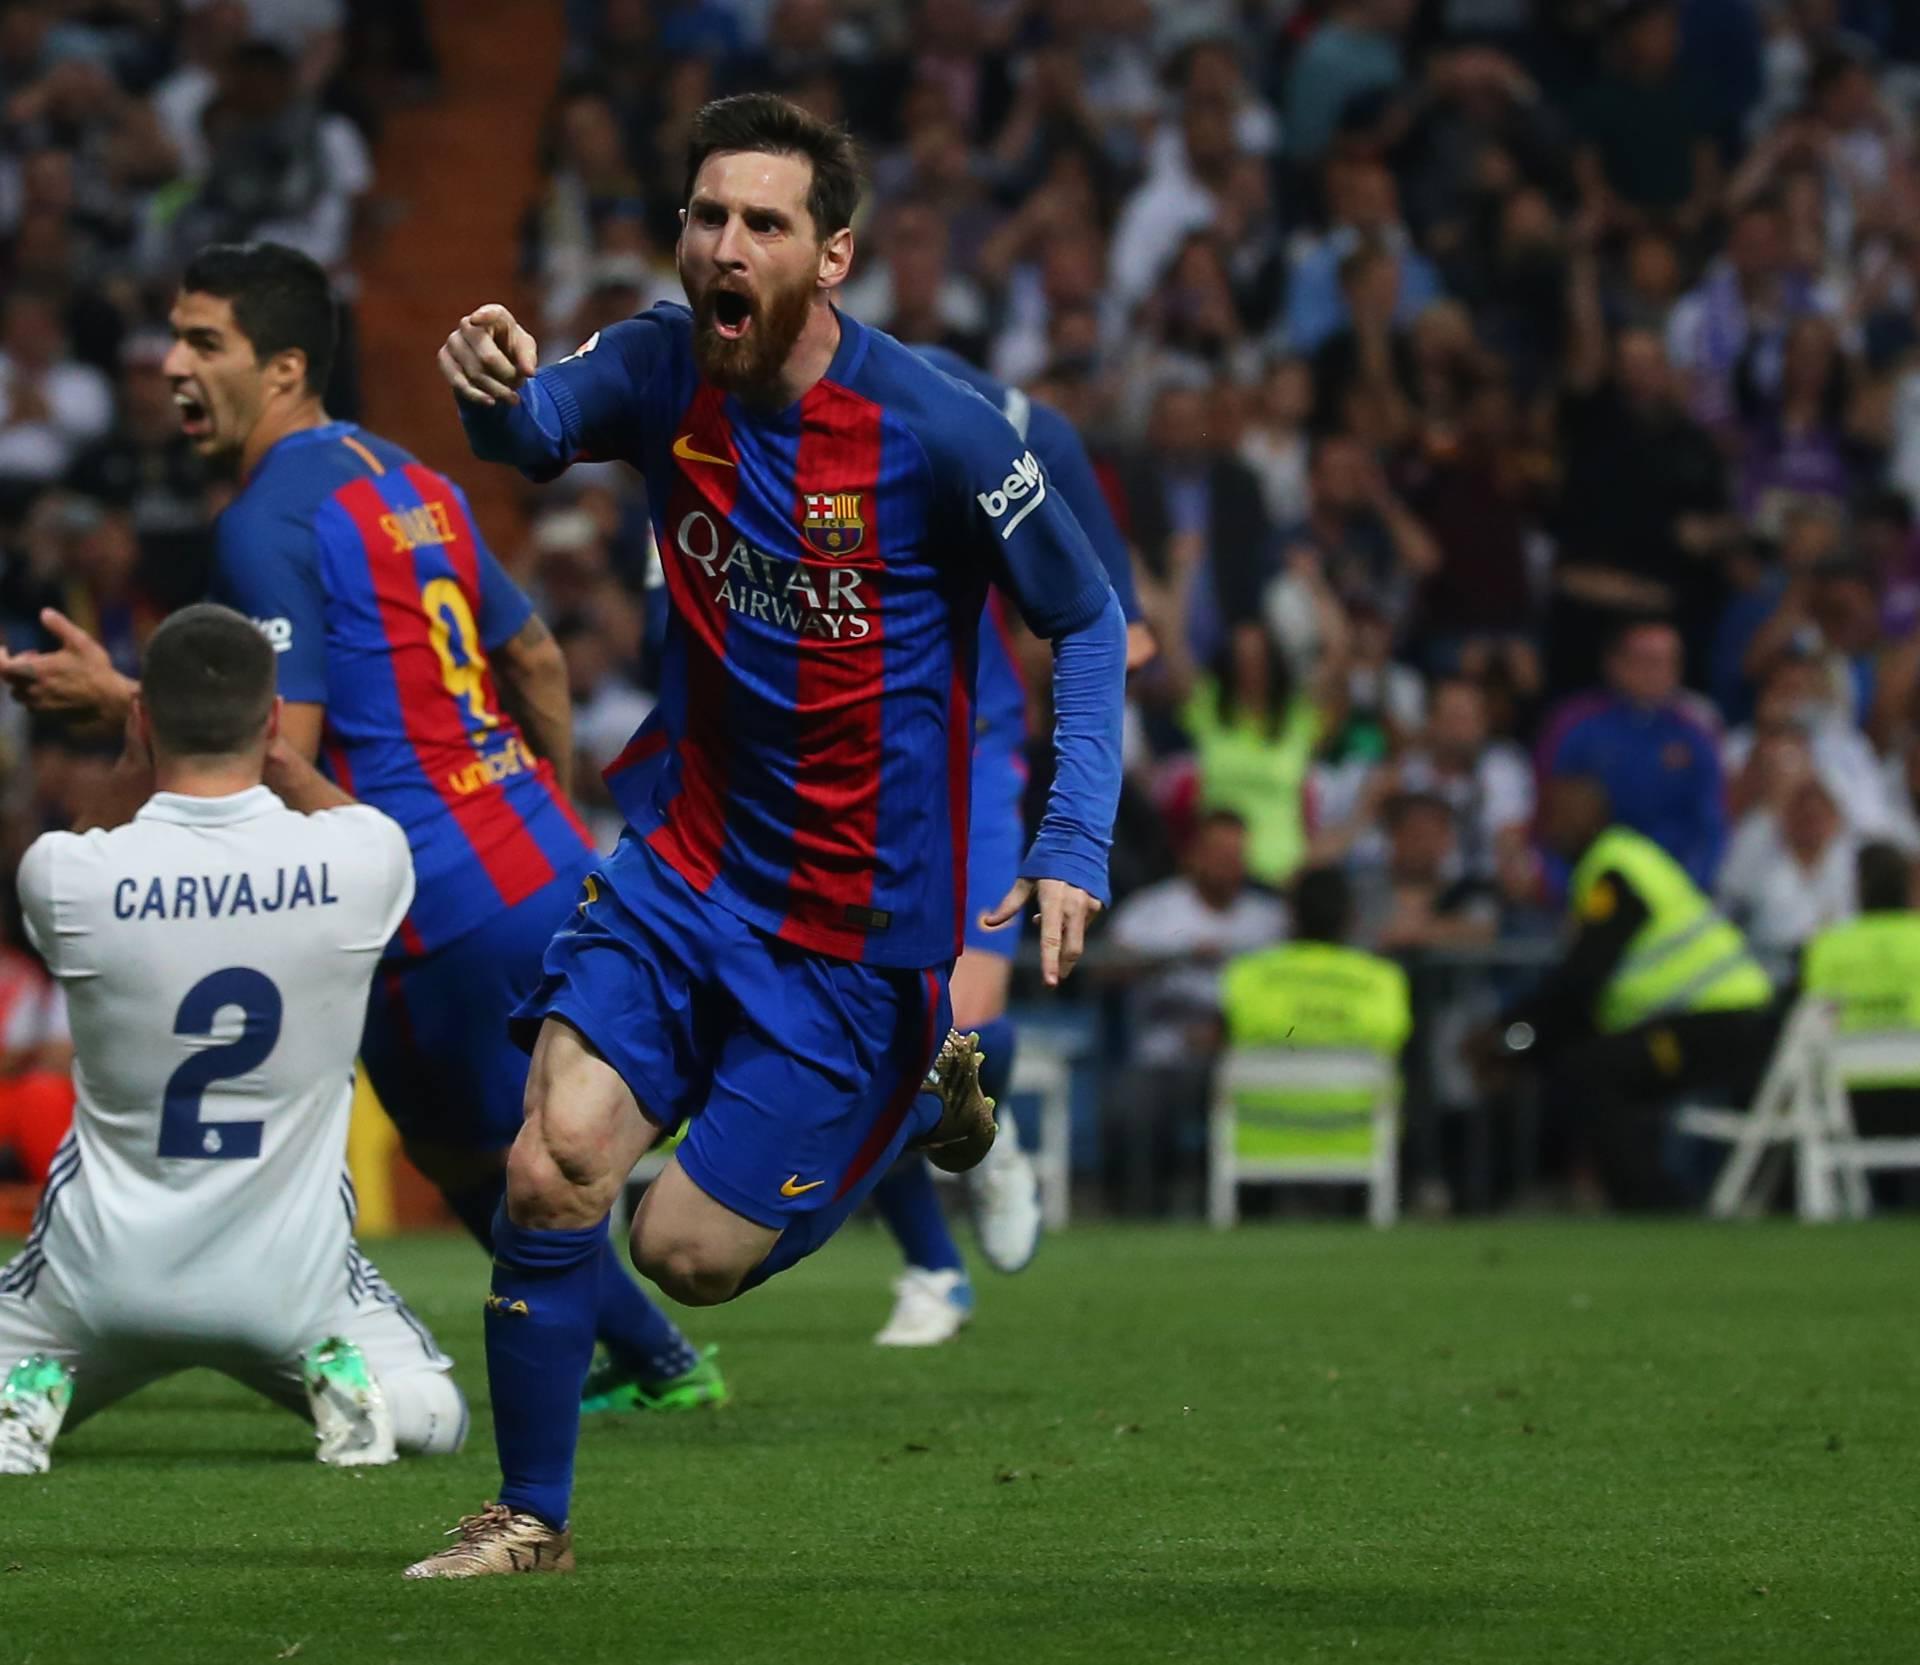 Barcelona's Lionel Messi celebrates scoring their third goal